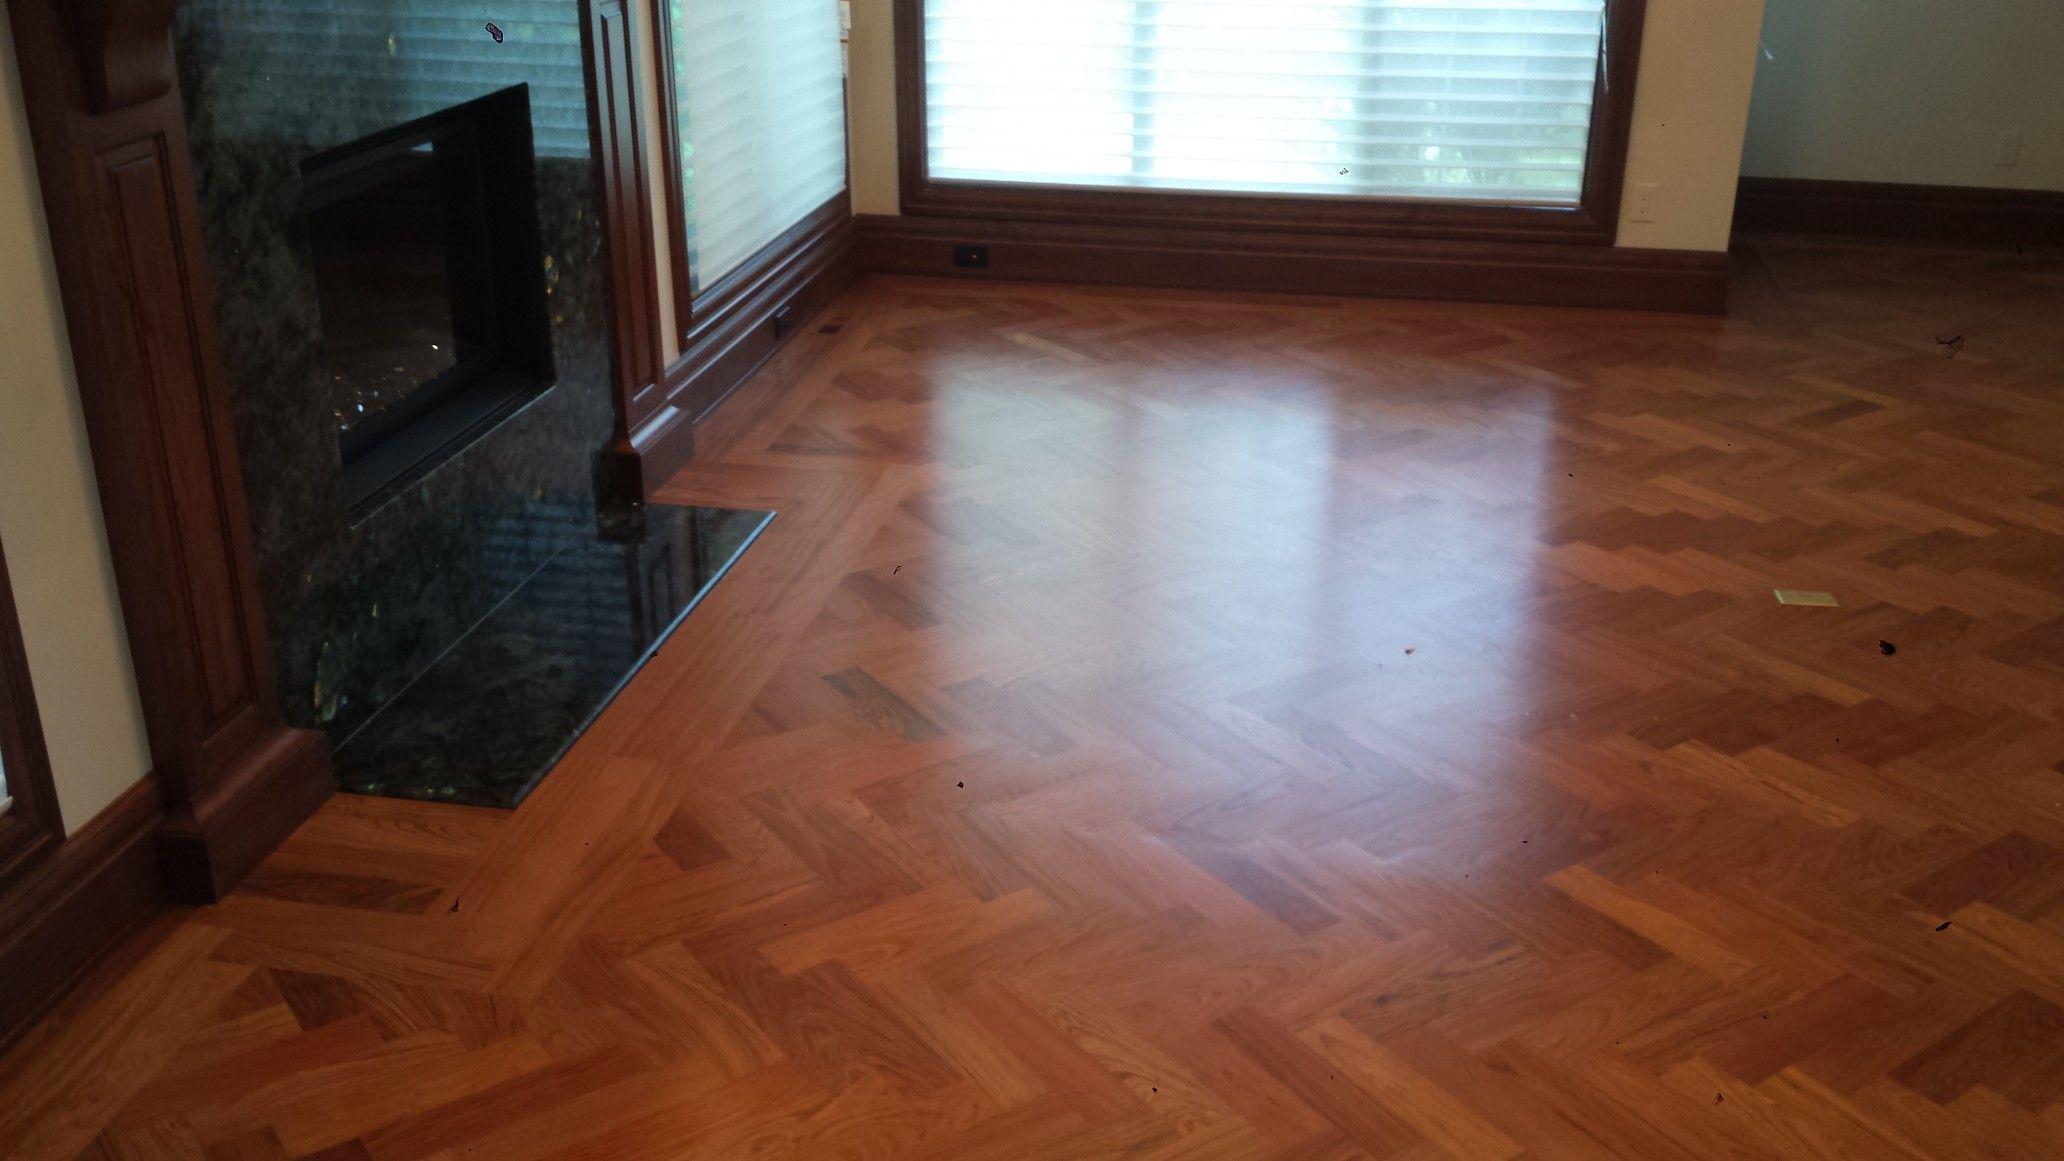 Pin by Lyn Doud on My work Hardwood floors, Flooring